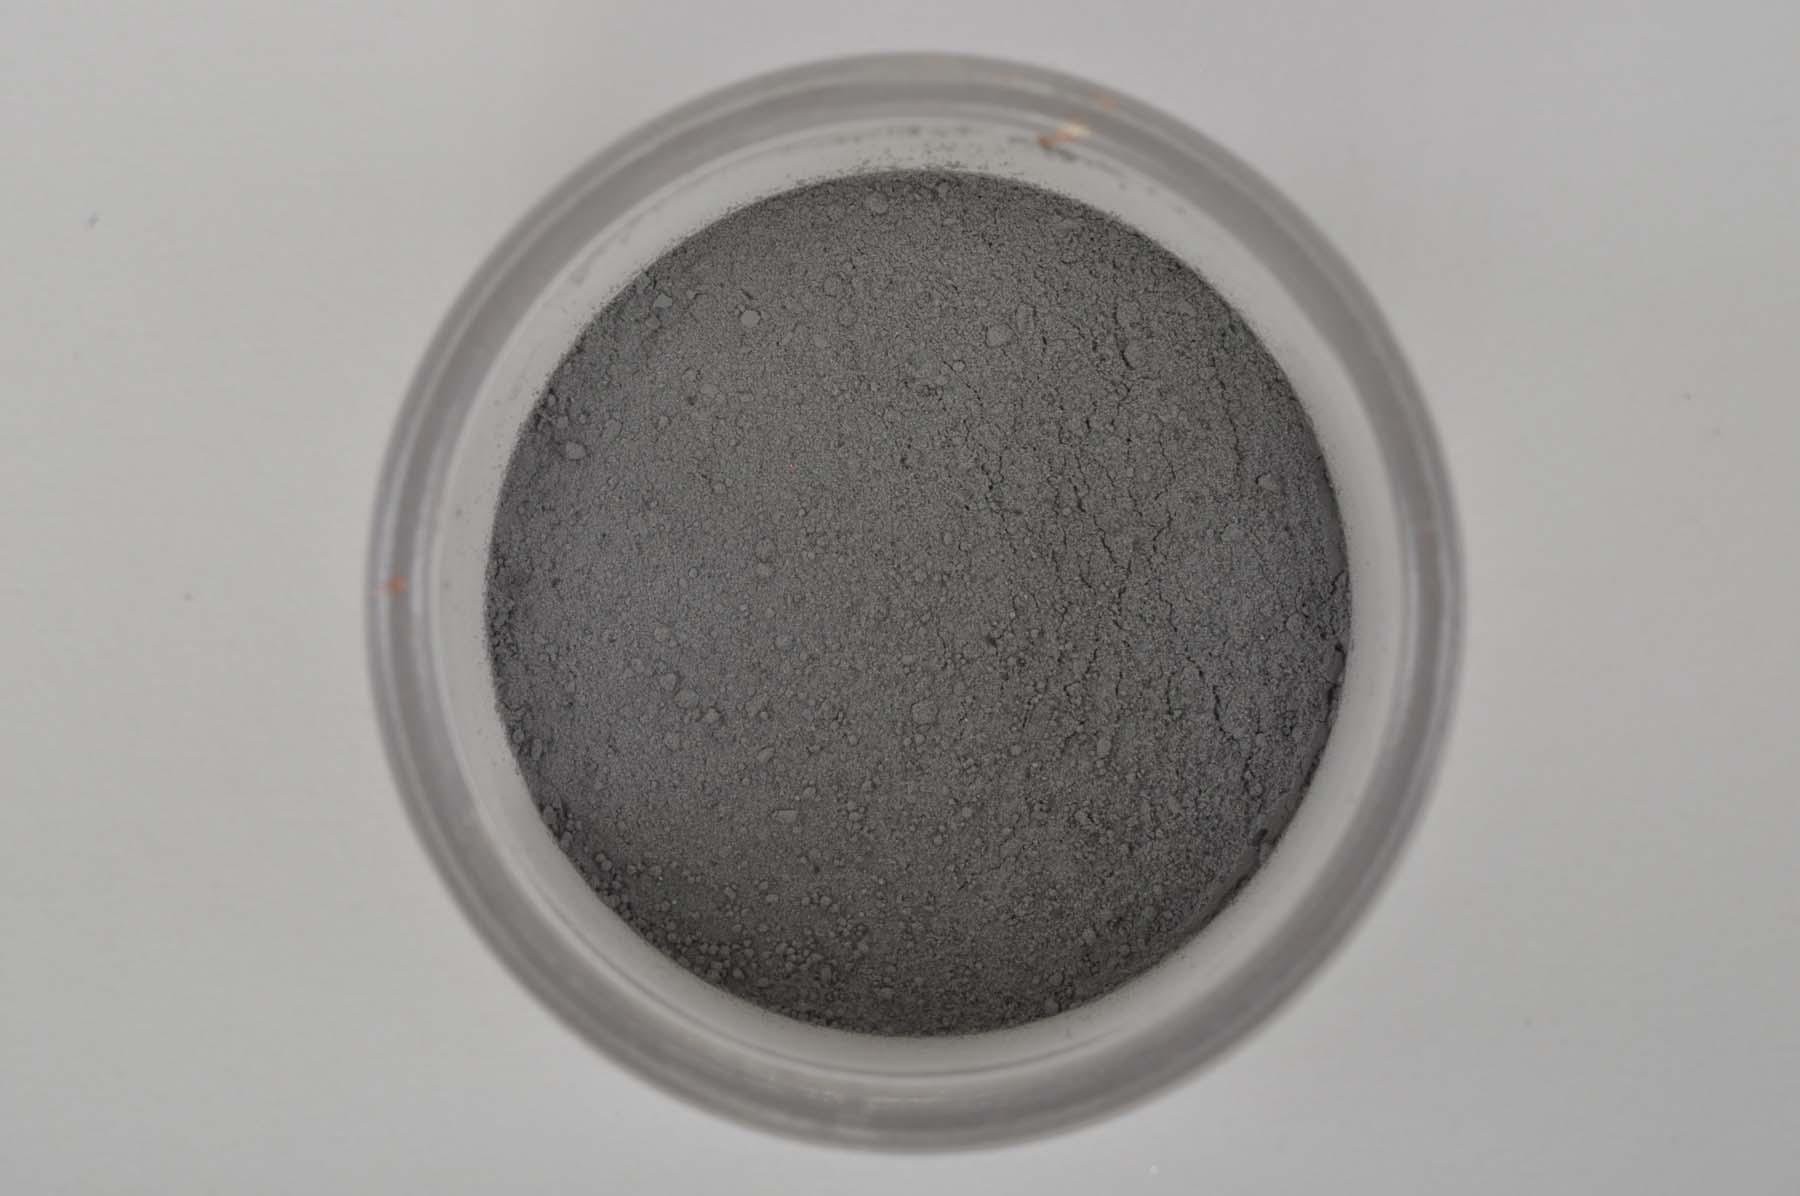 Nlp030 Nl Dusting Powder Dove Grey